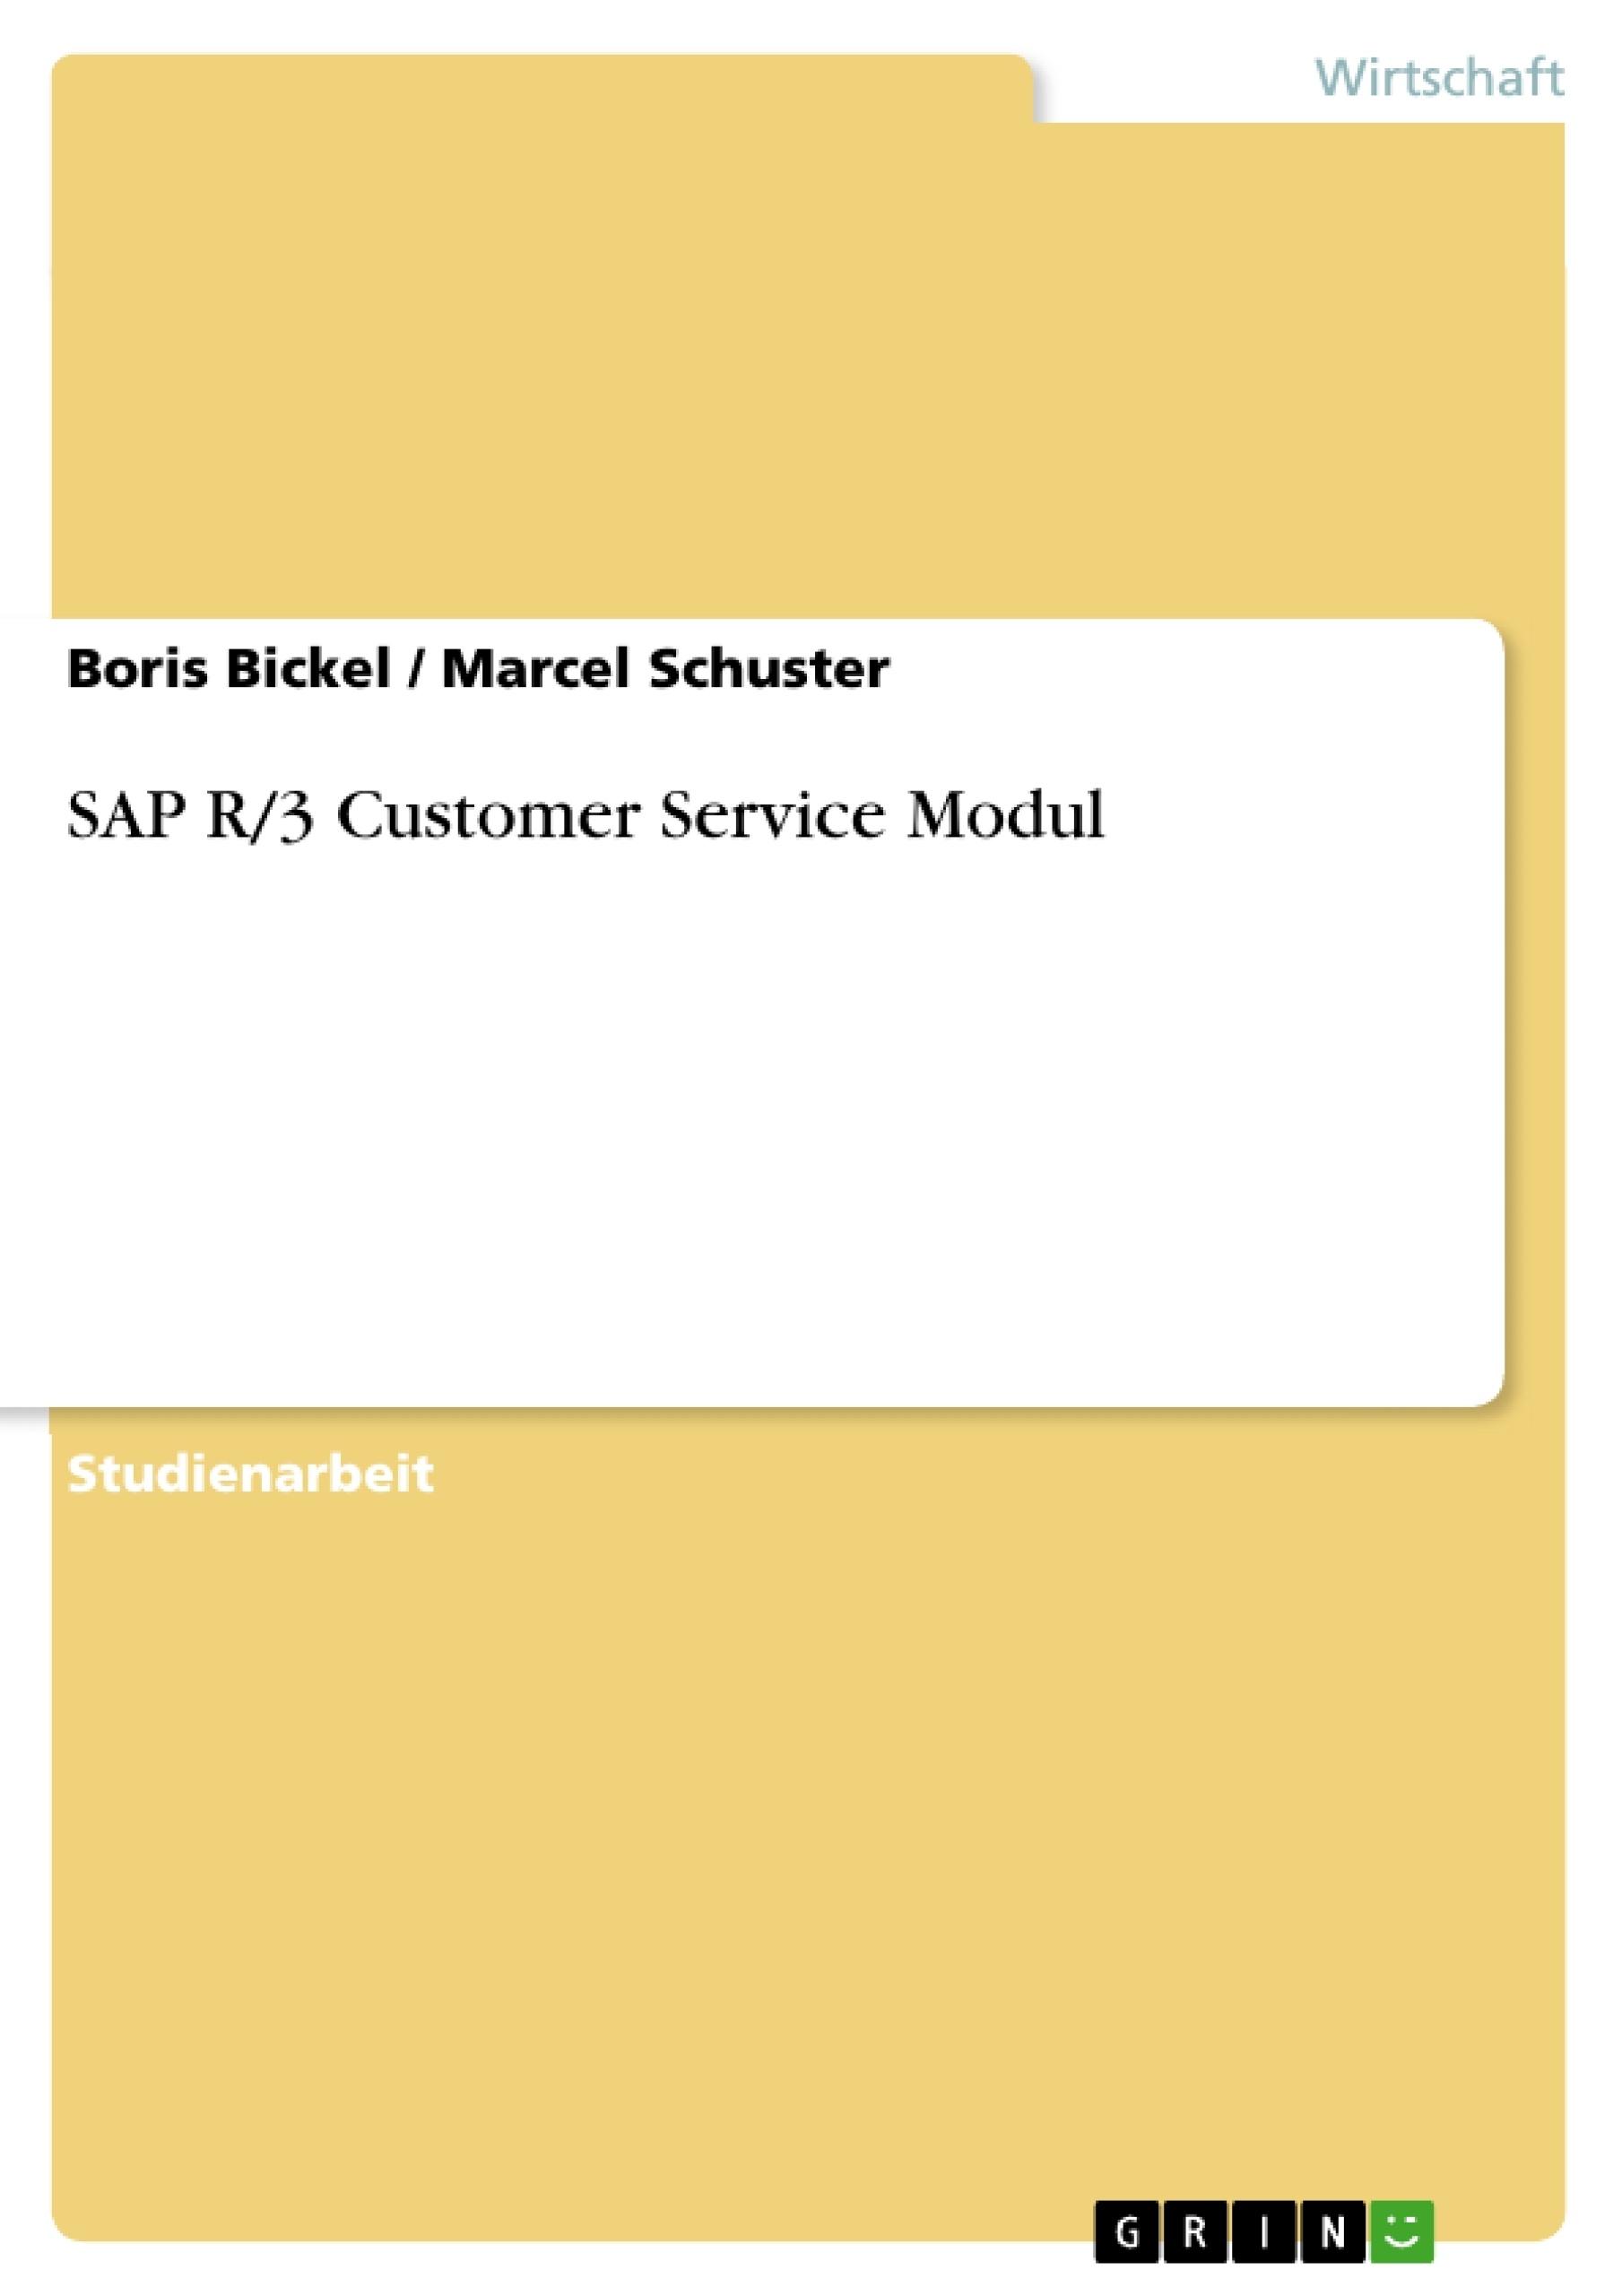 Titel: SAP R/3 Customer Service Modul